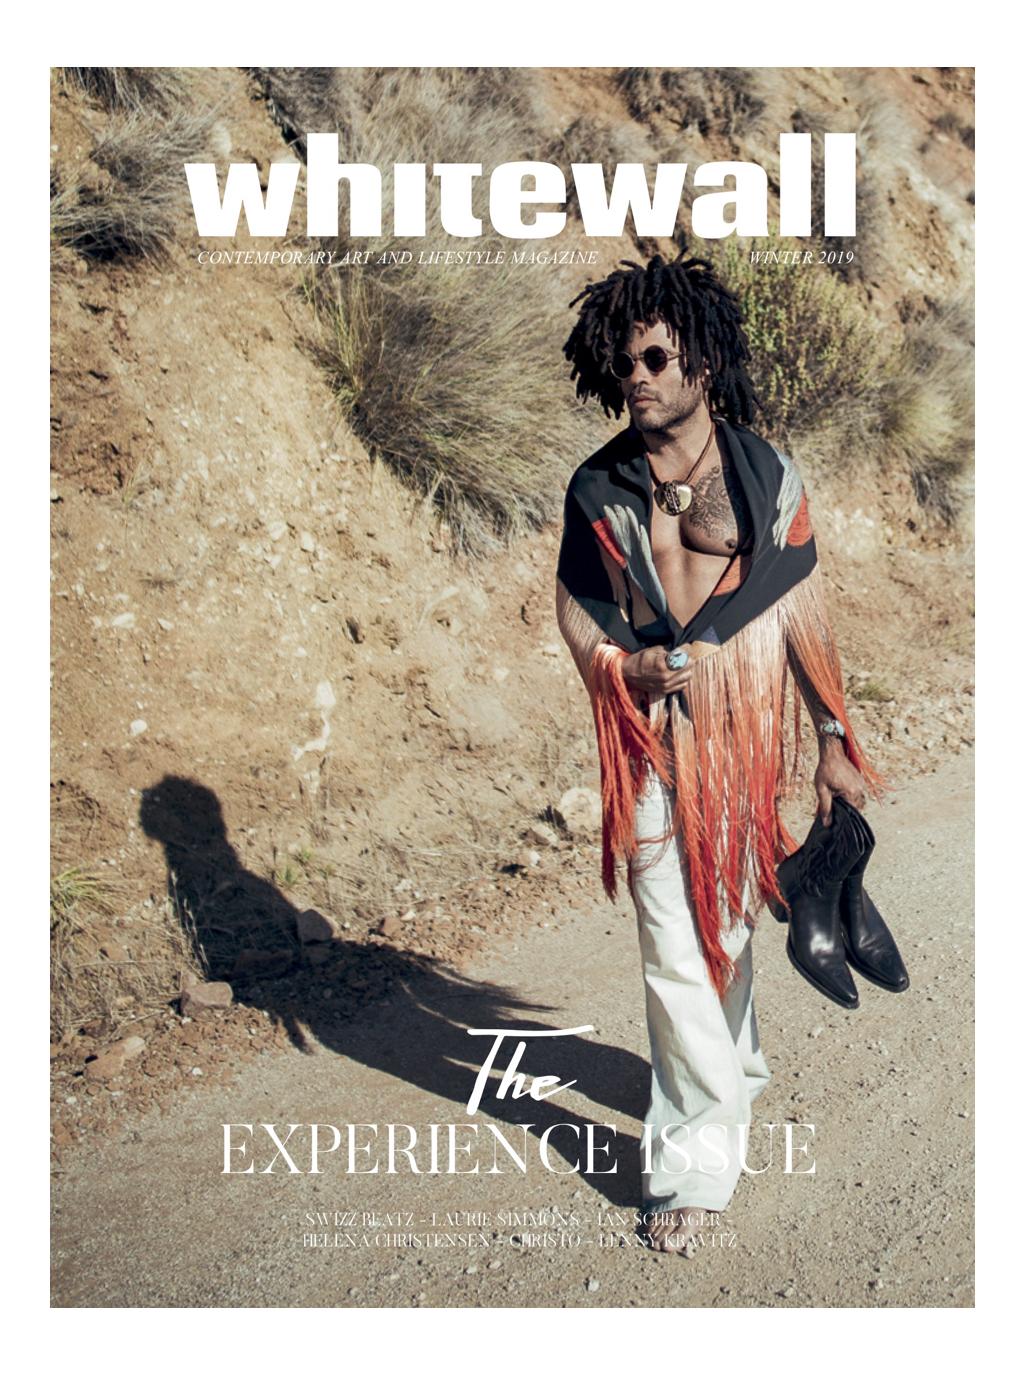 22_whitewall-image.jpg